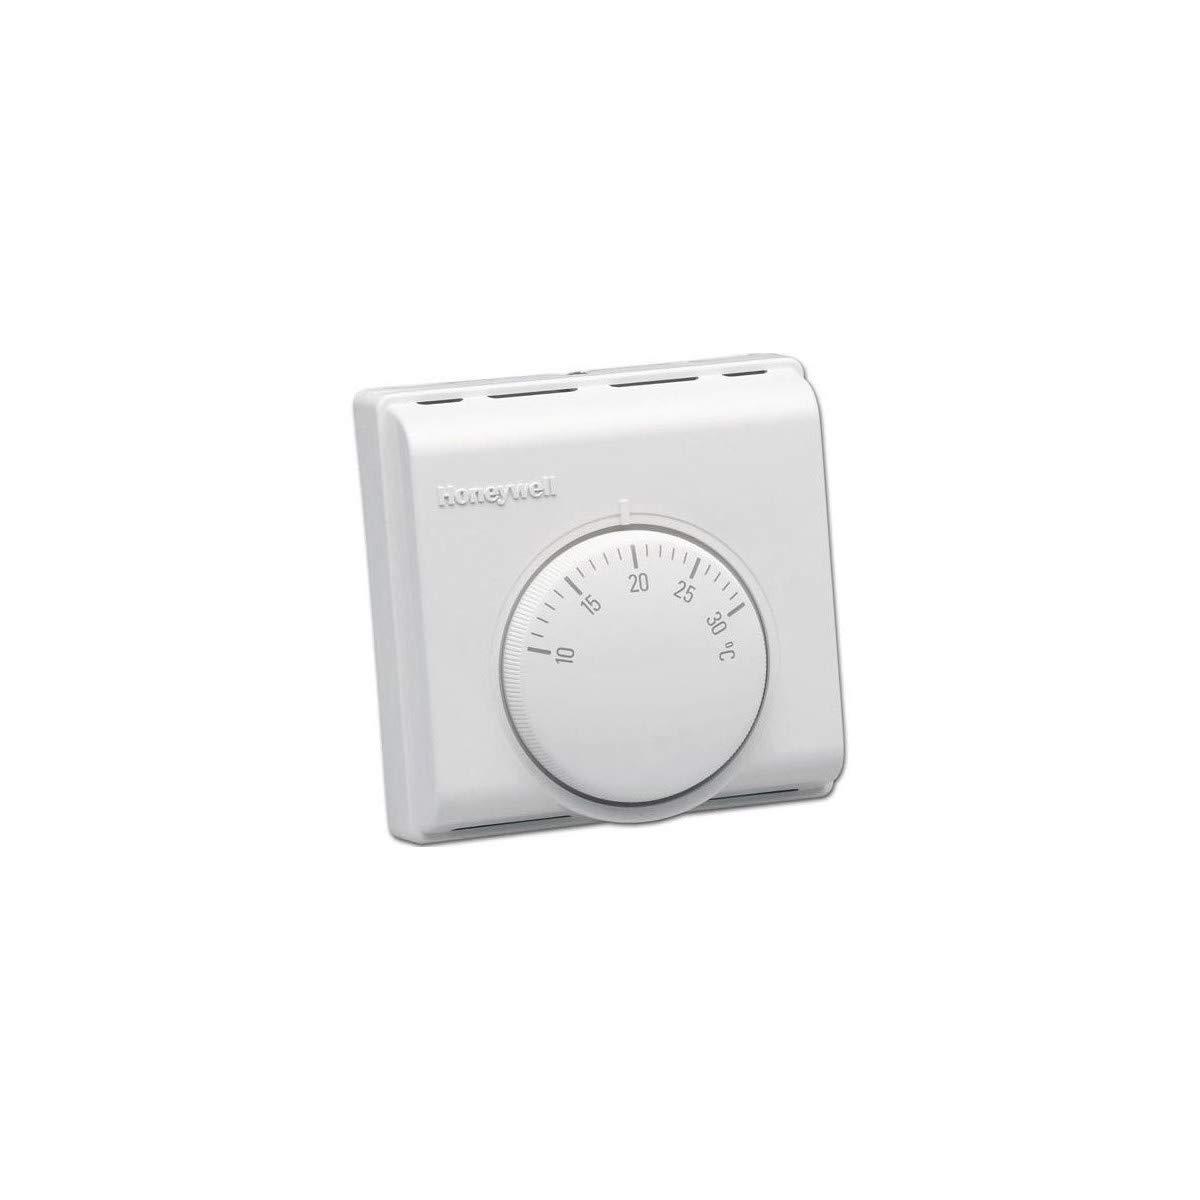 HoneyWell T6360A1004-Thermostat ambiance Wechselkontakt